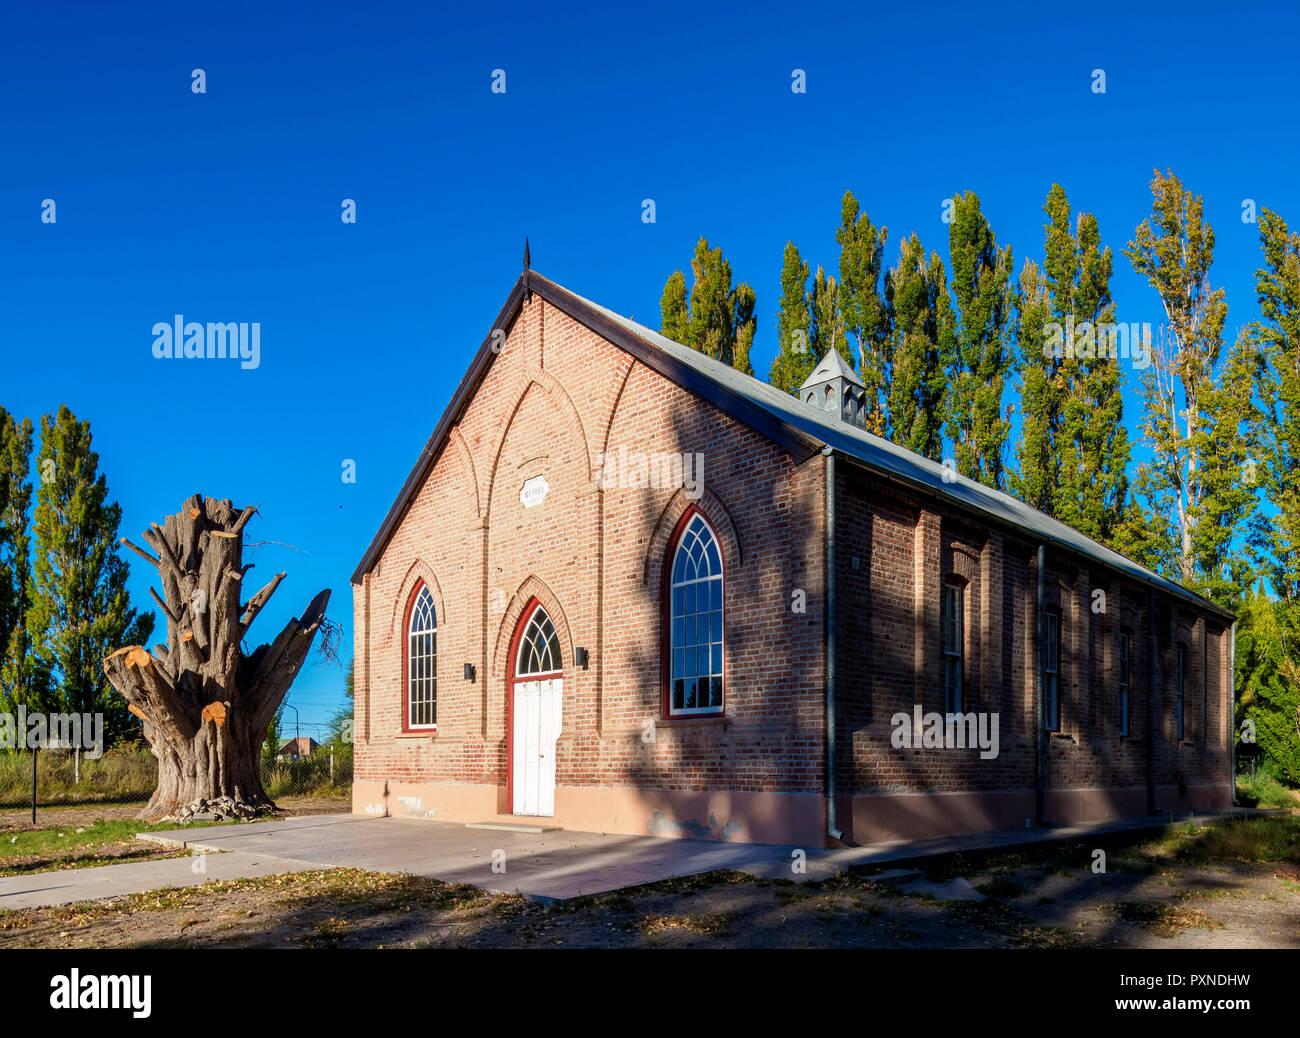 New Bethel Chapel, Gaiman, The Welsh Settlement, Chubut Province, Patagonia, Argentina - Stock Image